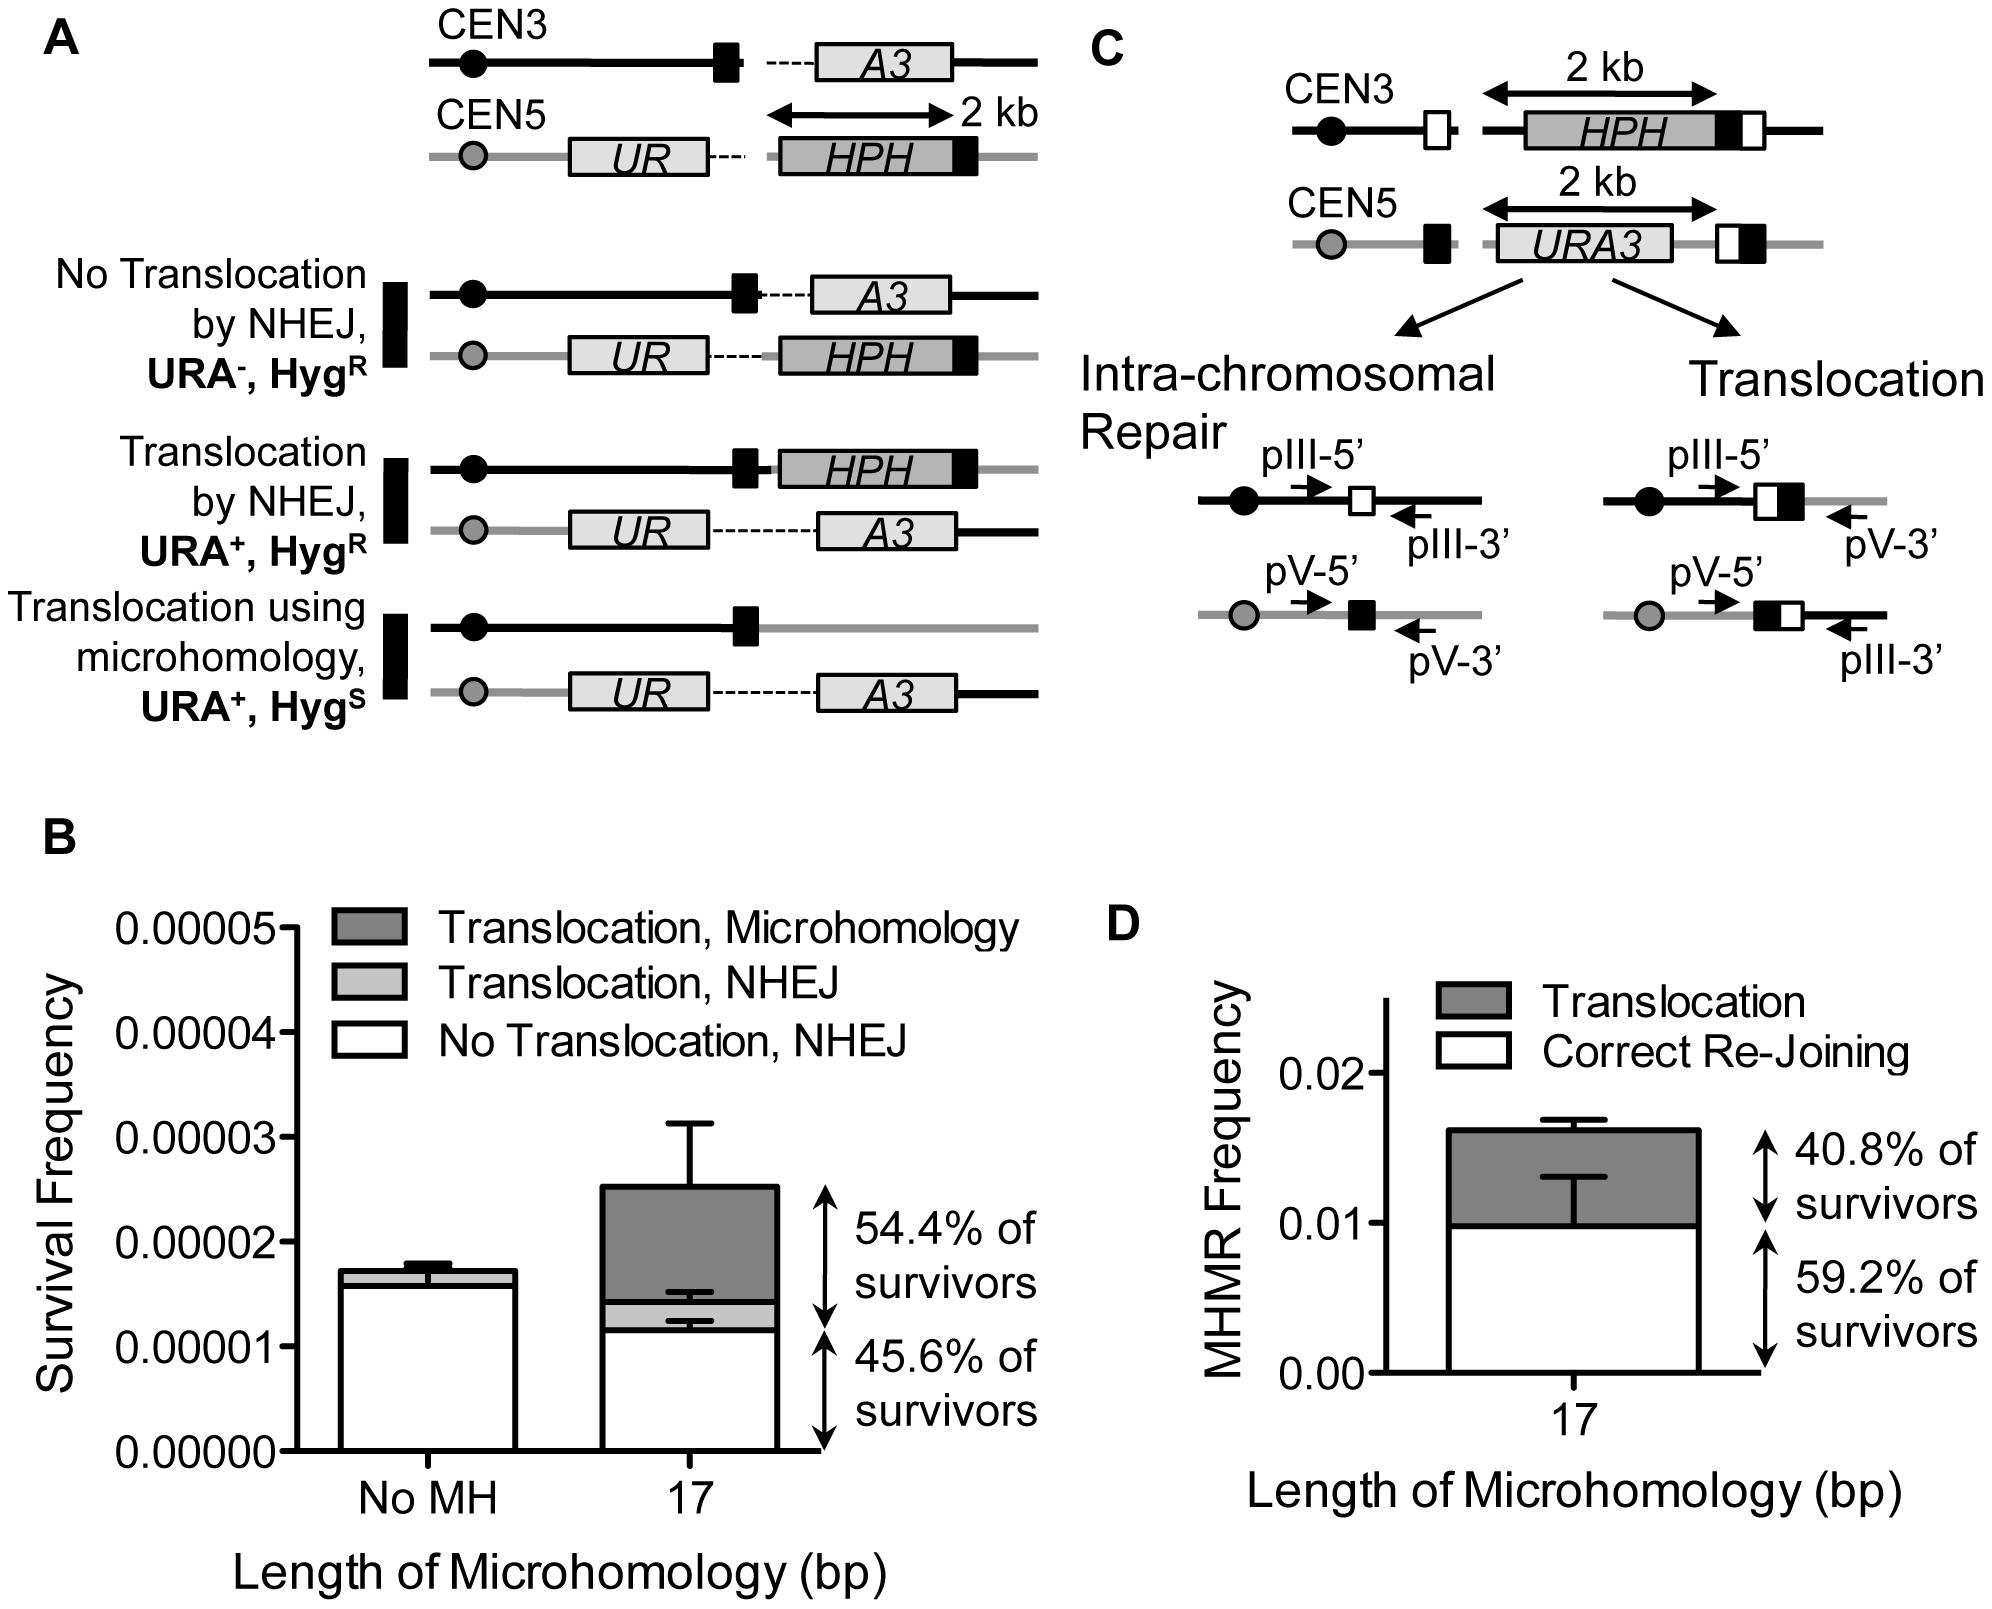 MHMR stimulates HO break-induced chromosomal translocations.